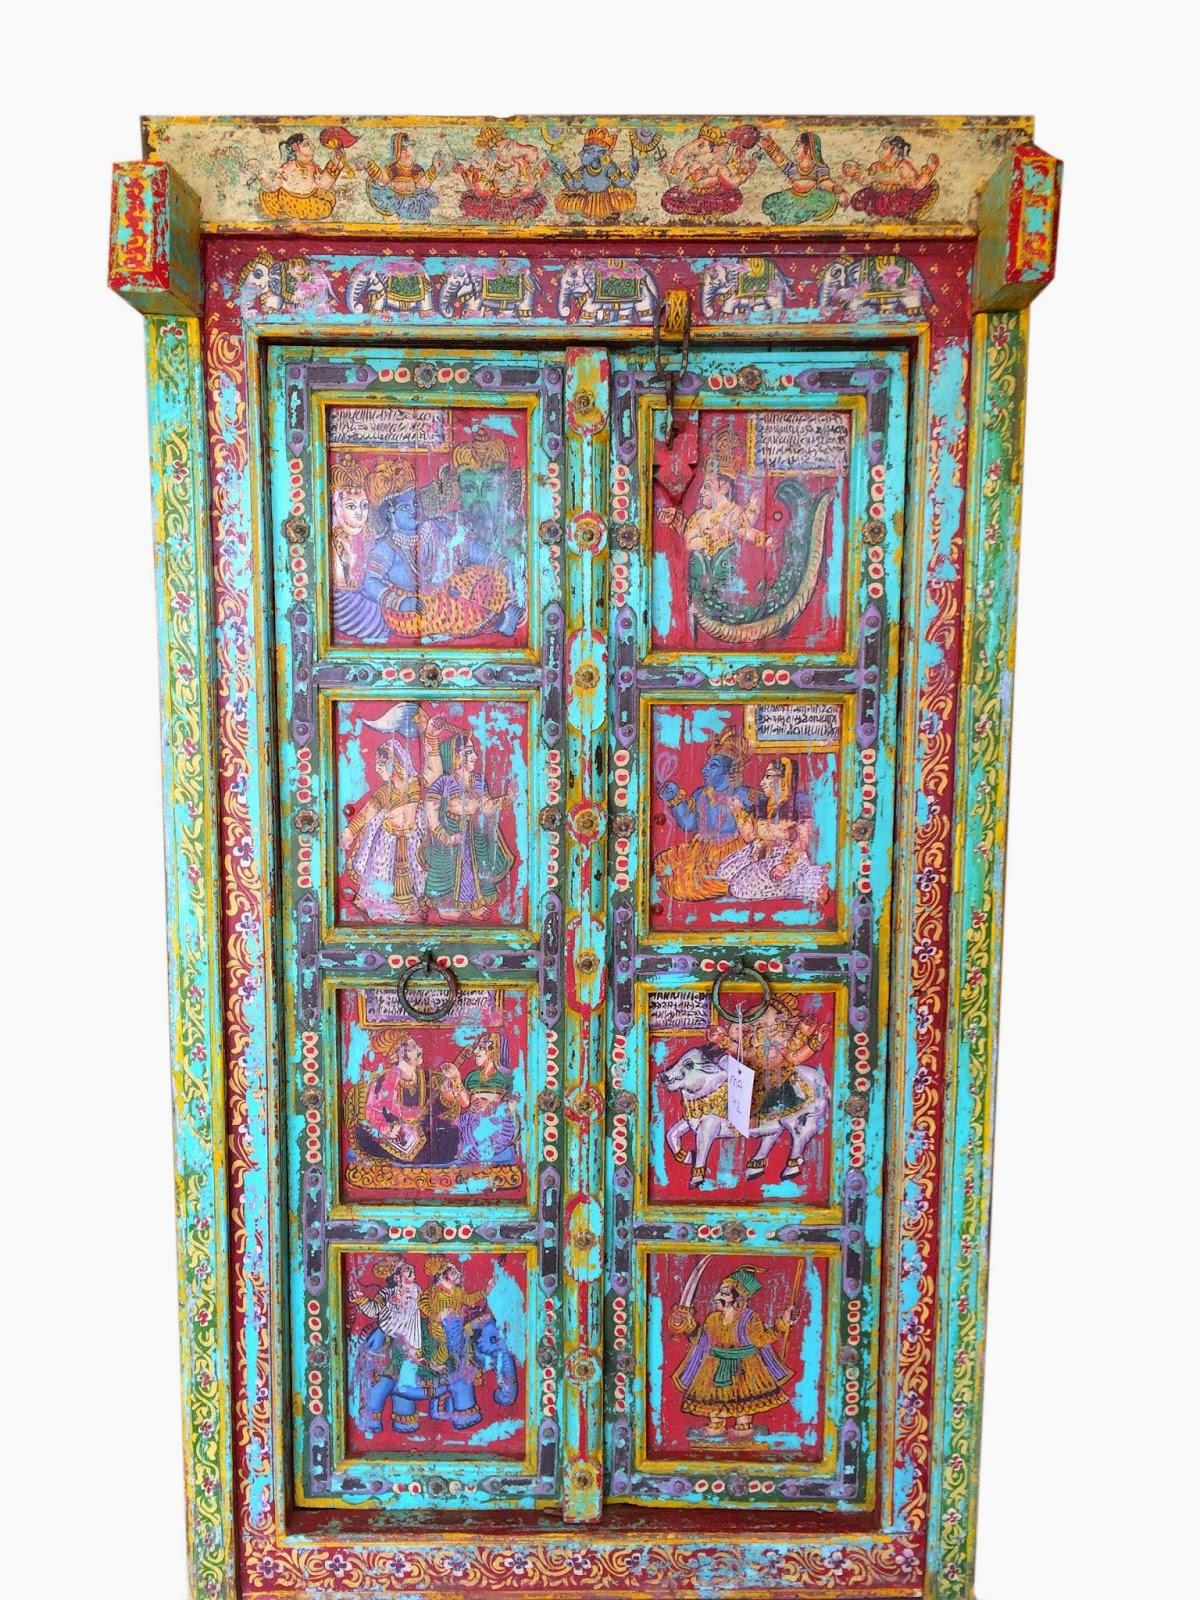 http://www.amazon.com/gp/product/B00PQ445FG - Indian Wooden Furnitures: Unique Historic Indian Antique Door #doors